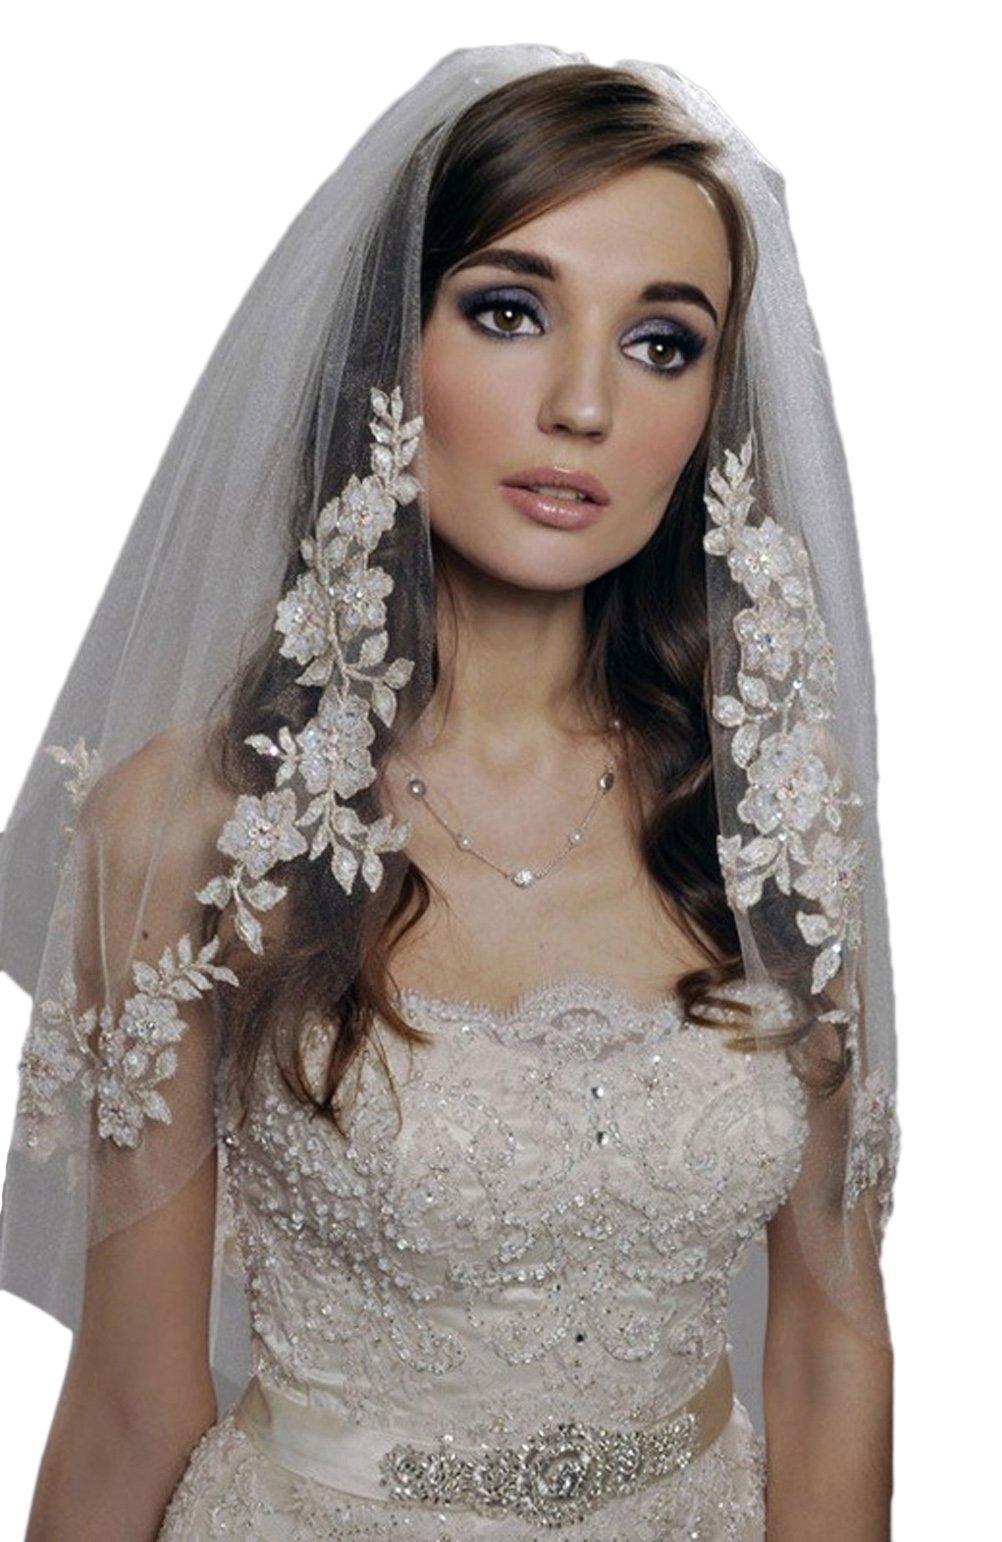 Xoemir Off White Short Tulle Bridal Veils for Wedding Hair Headpieces for Women